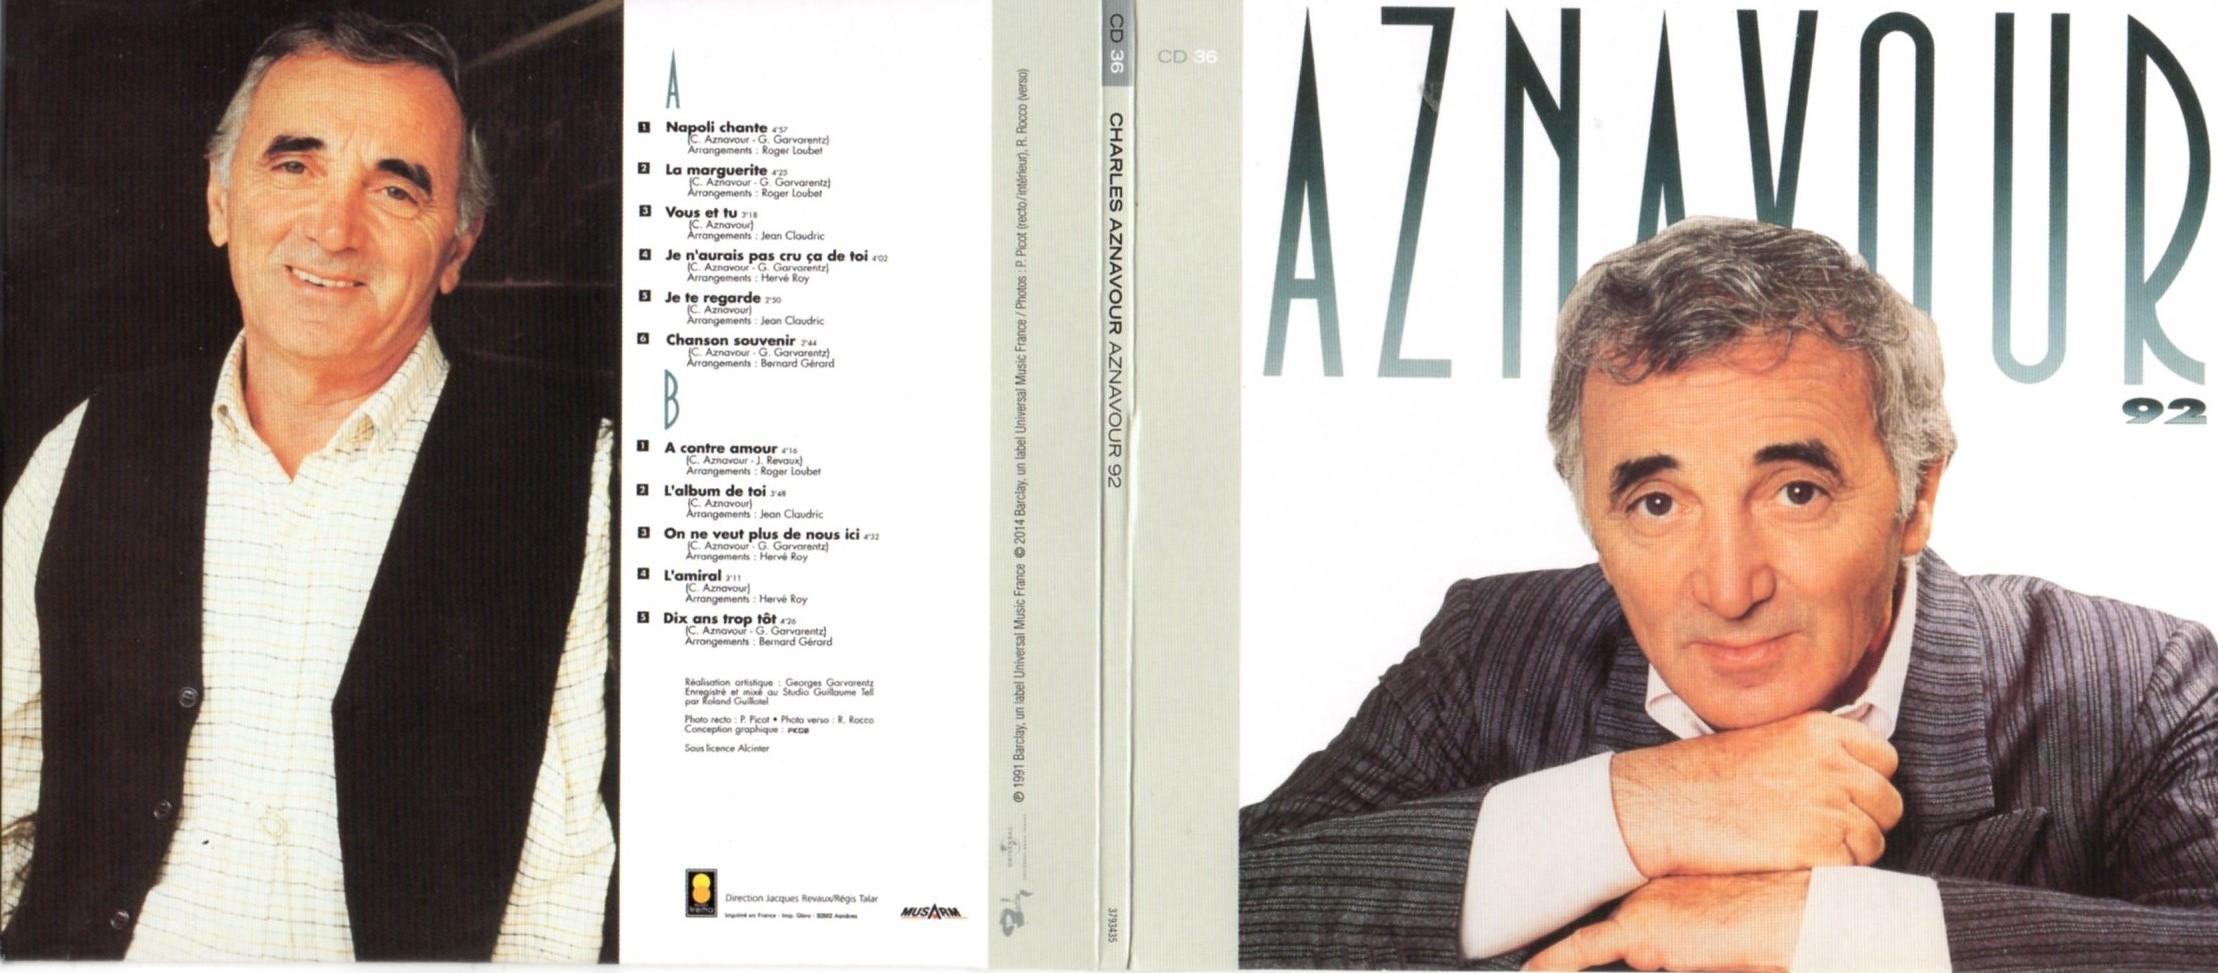 CHARLES AZNAVOUR - Aznavour 92 (1992) Gatefold Card board sleeve Replica - CD